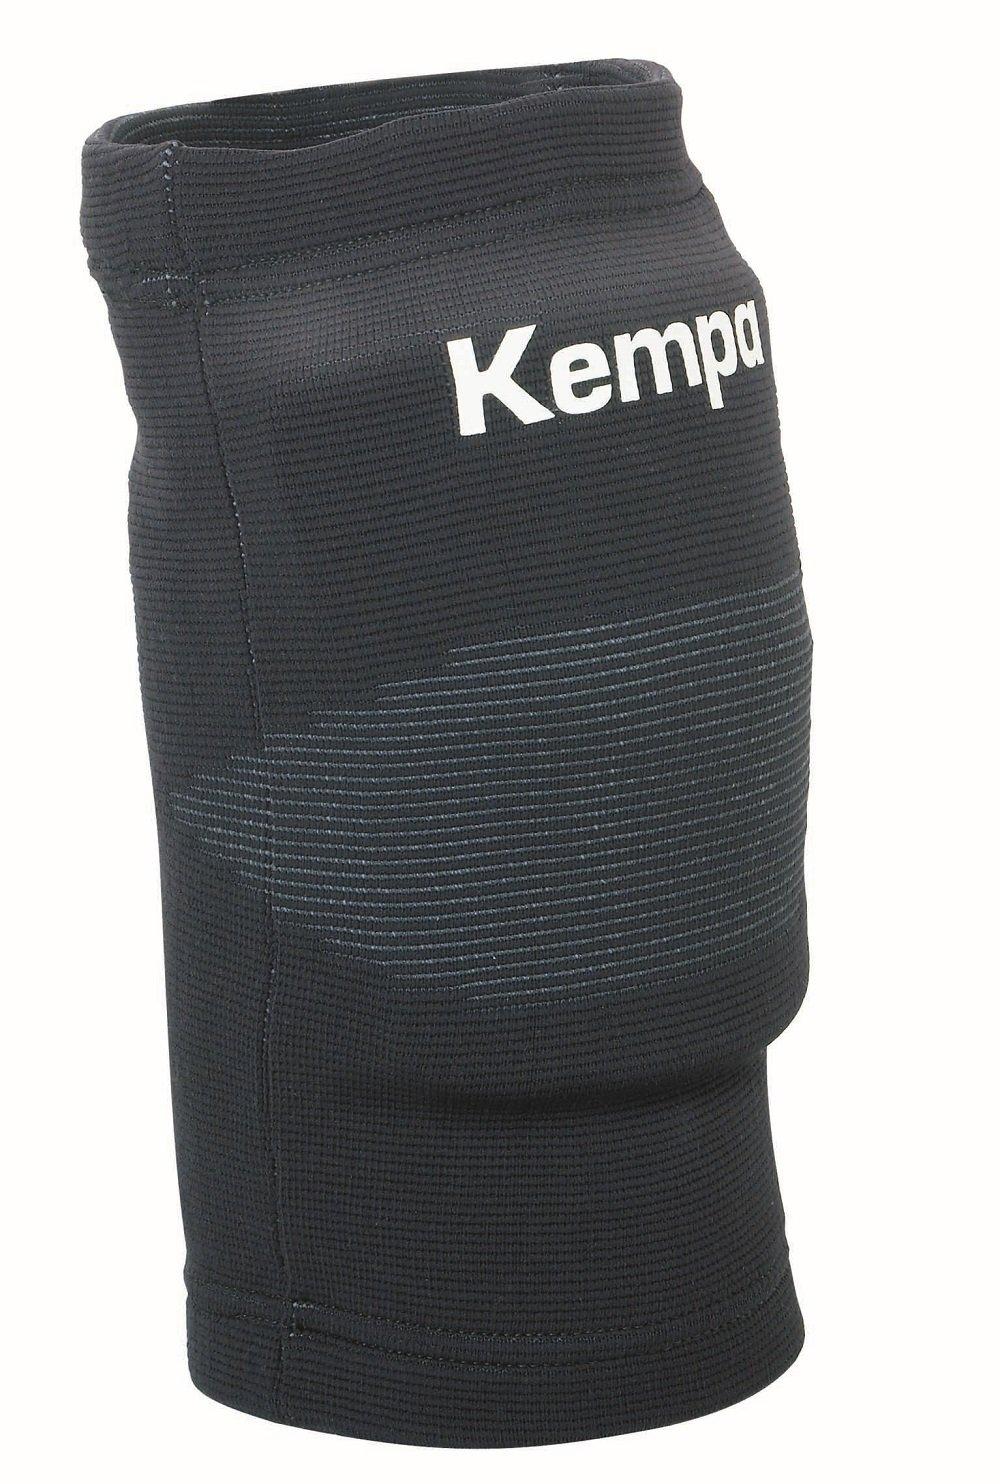 Kempa Rodillera acolchada para adultos, color negro